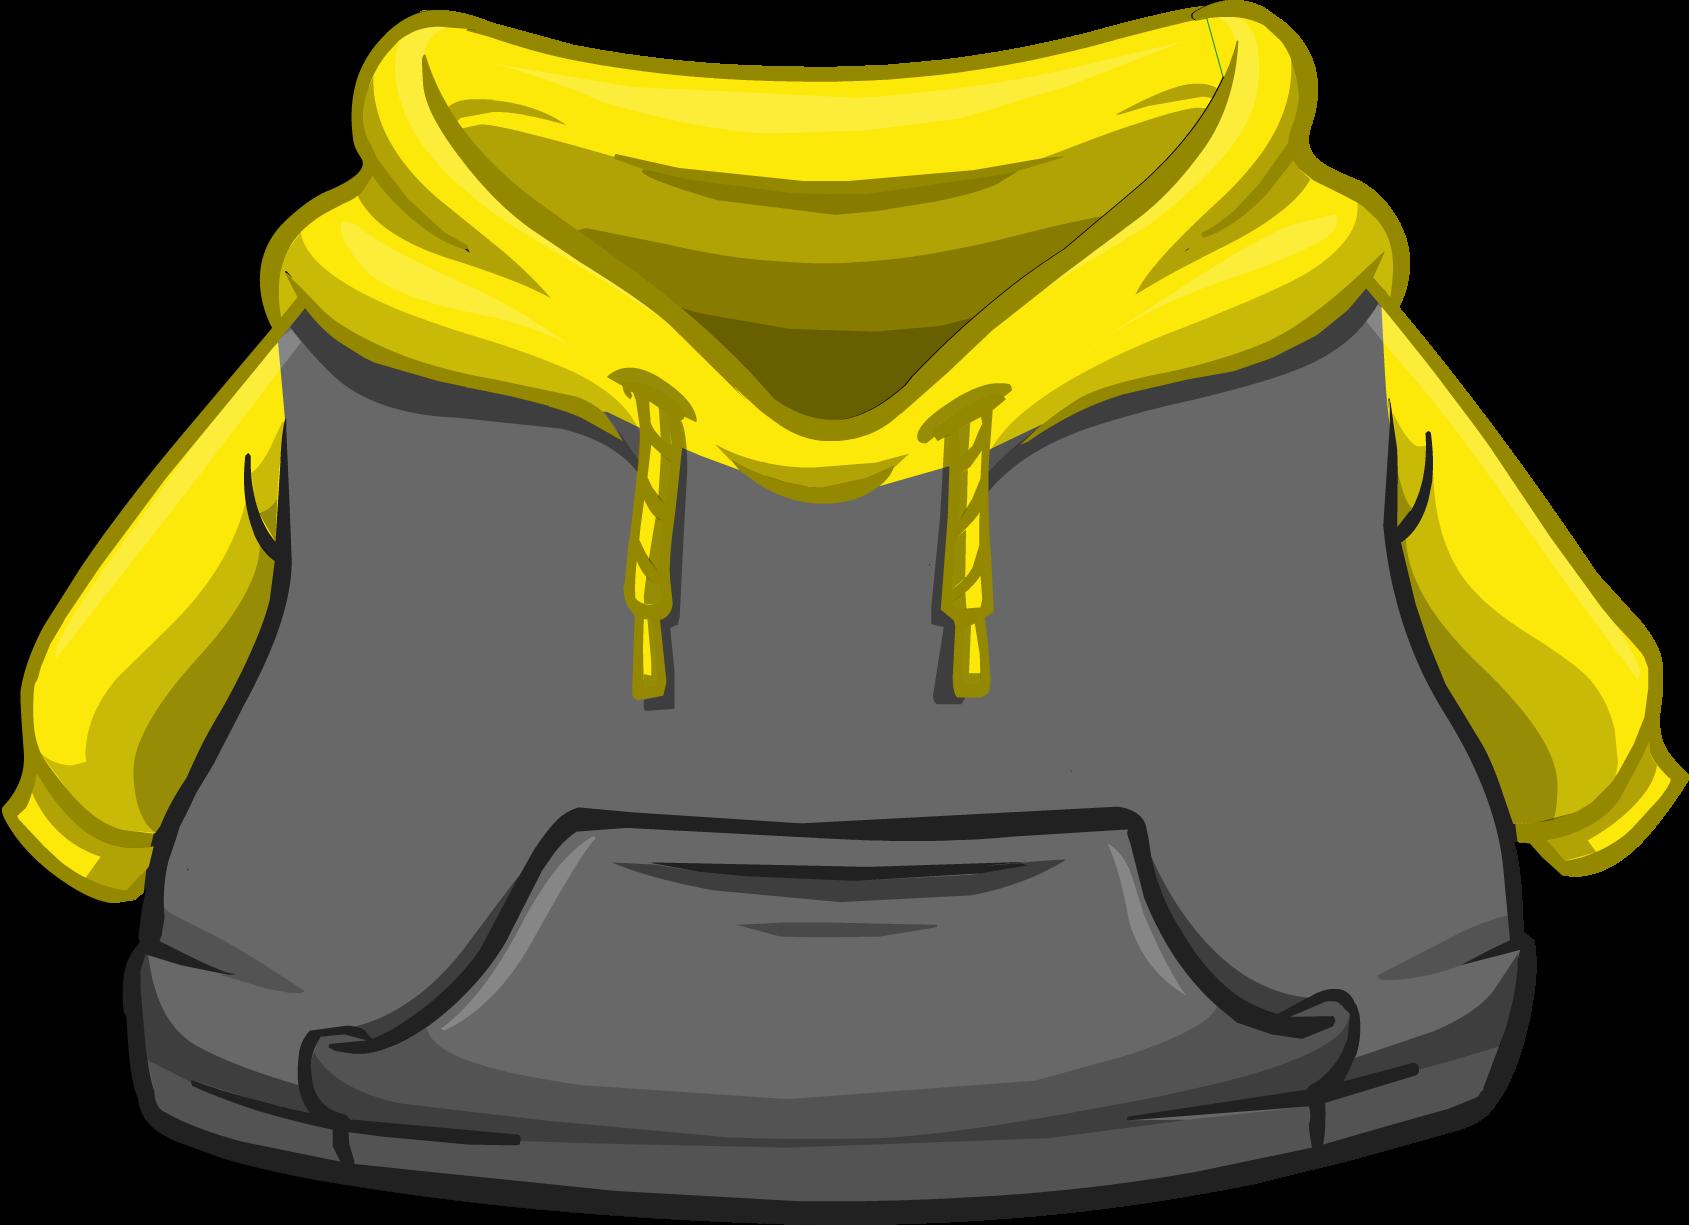 Cangurito Dos Tonos Amarillo y Negro